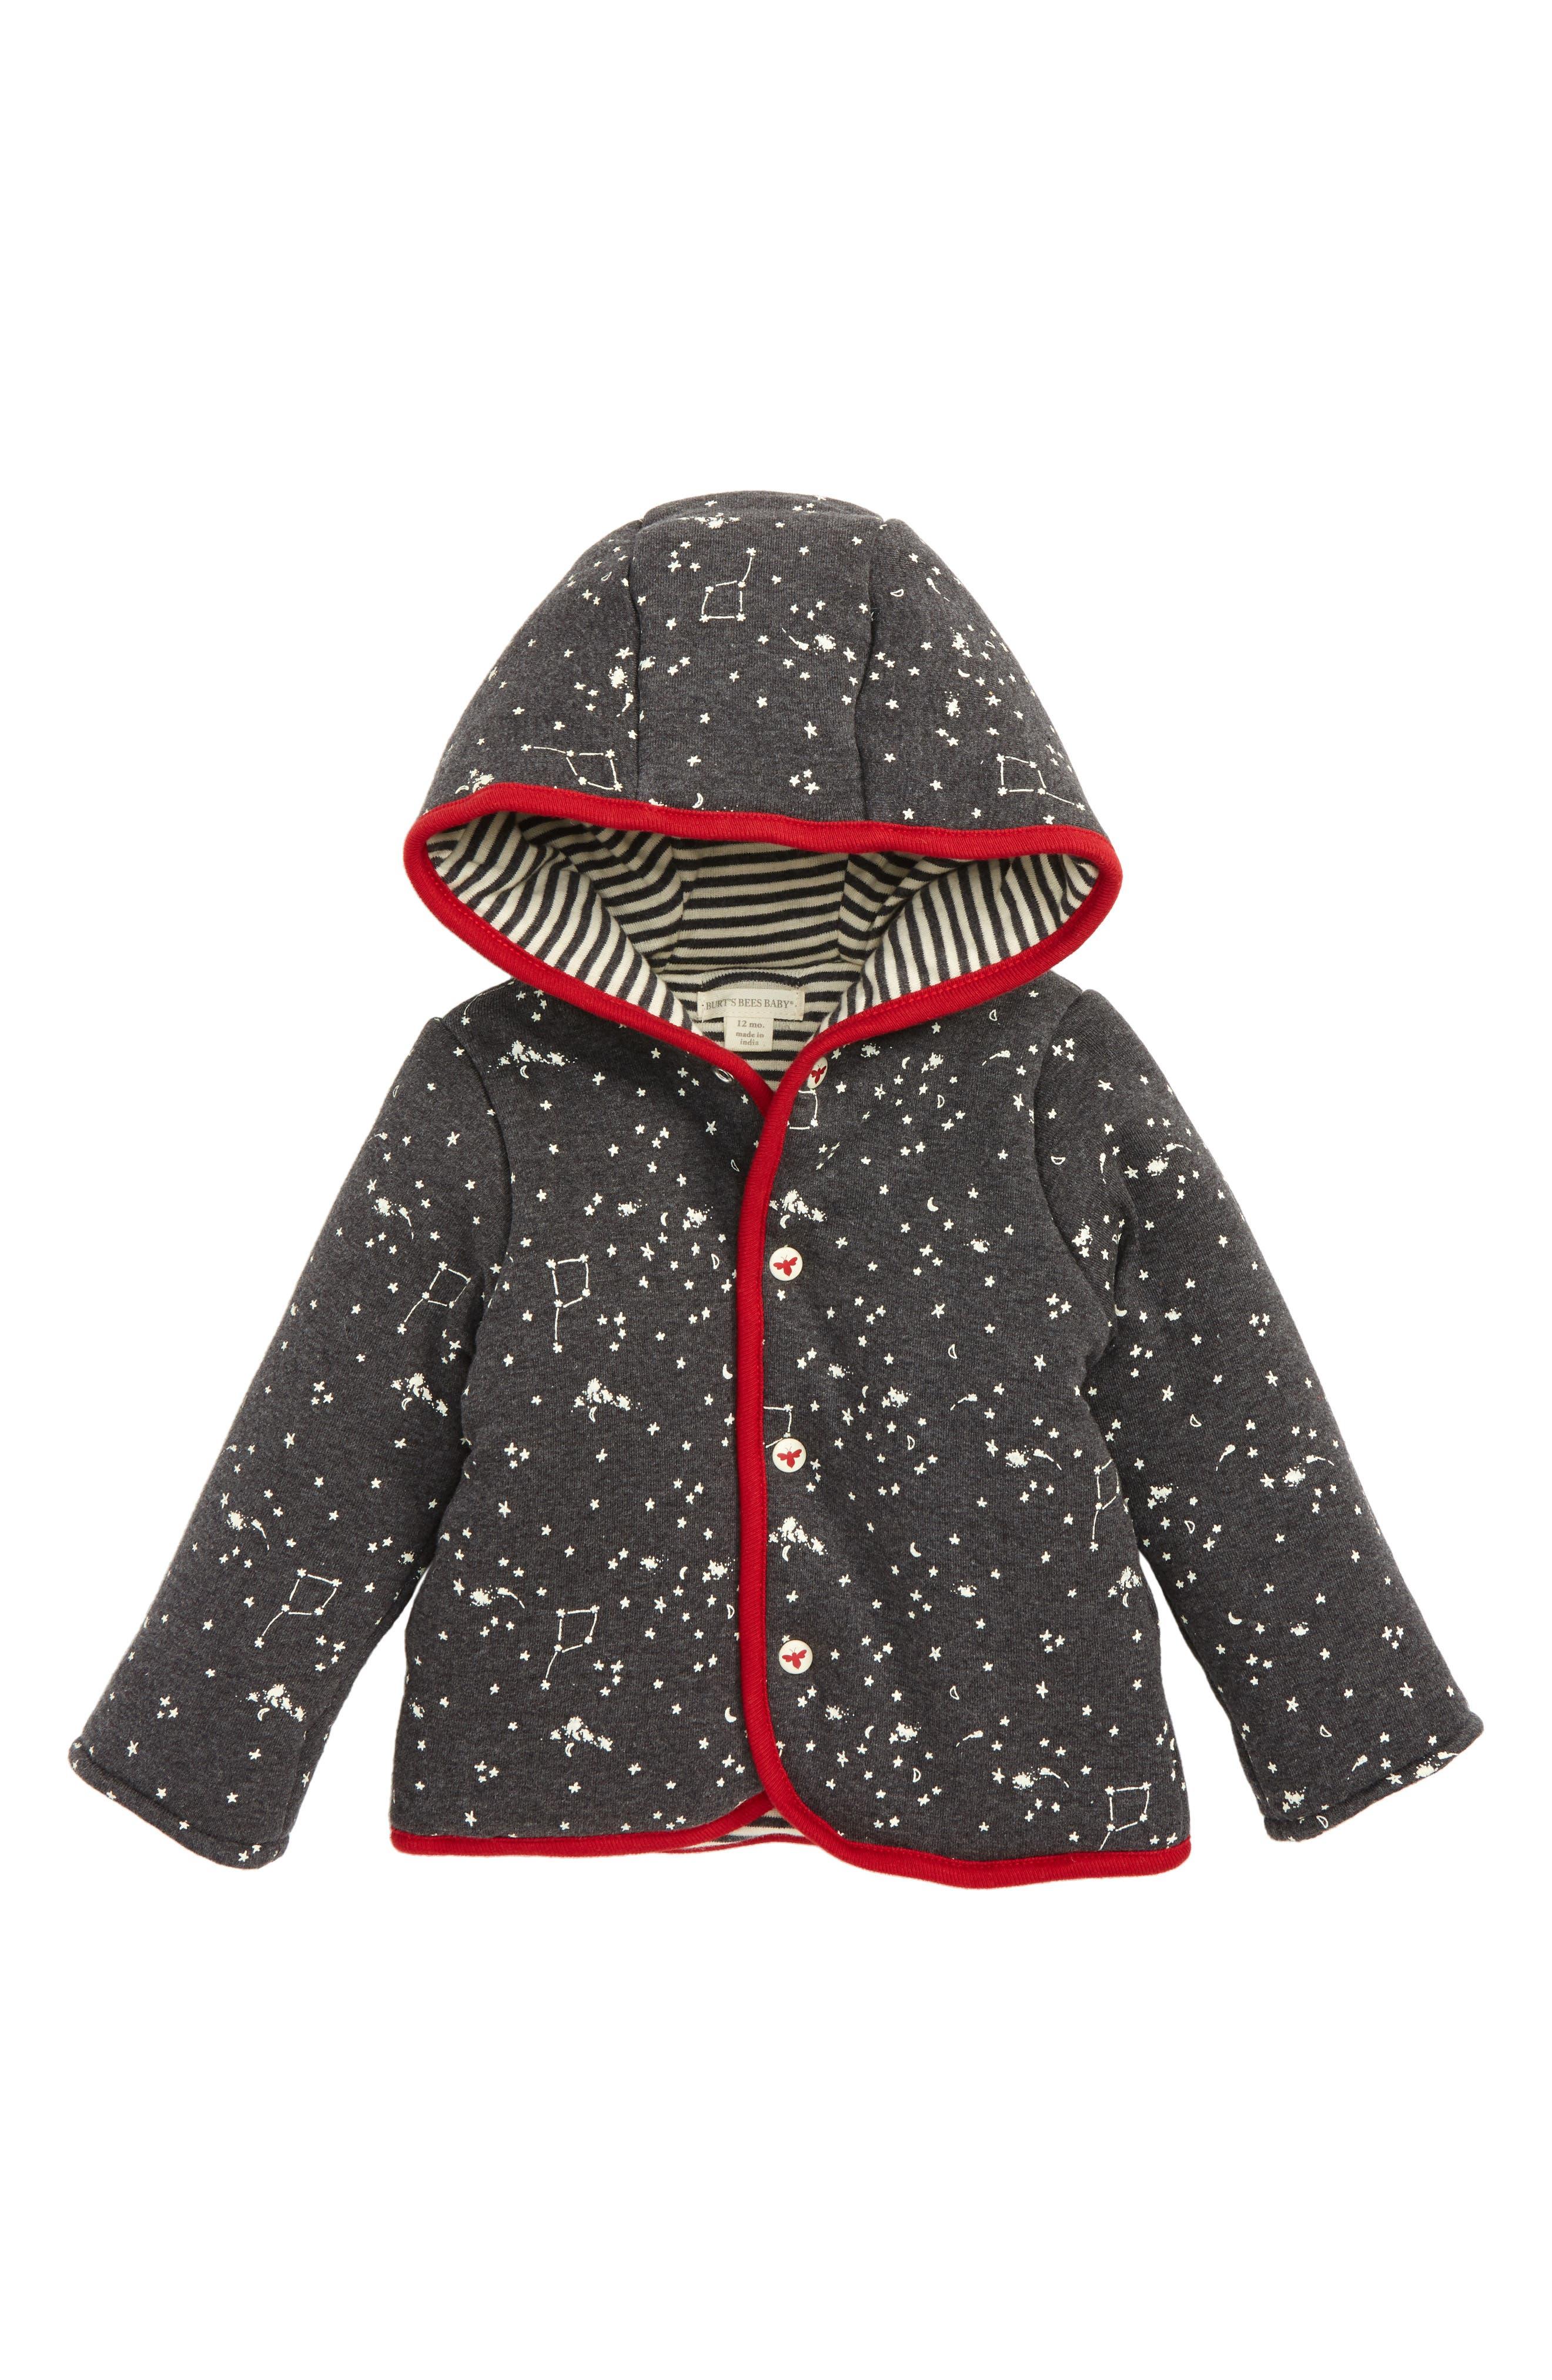 Alternate Image 1 Selected - Burt's Bees Reversible Organic Cotton Hoodie (Baby)